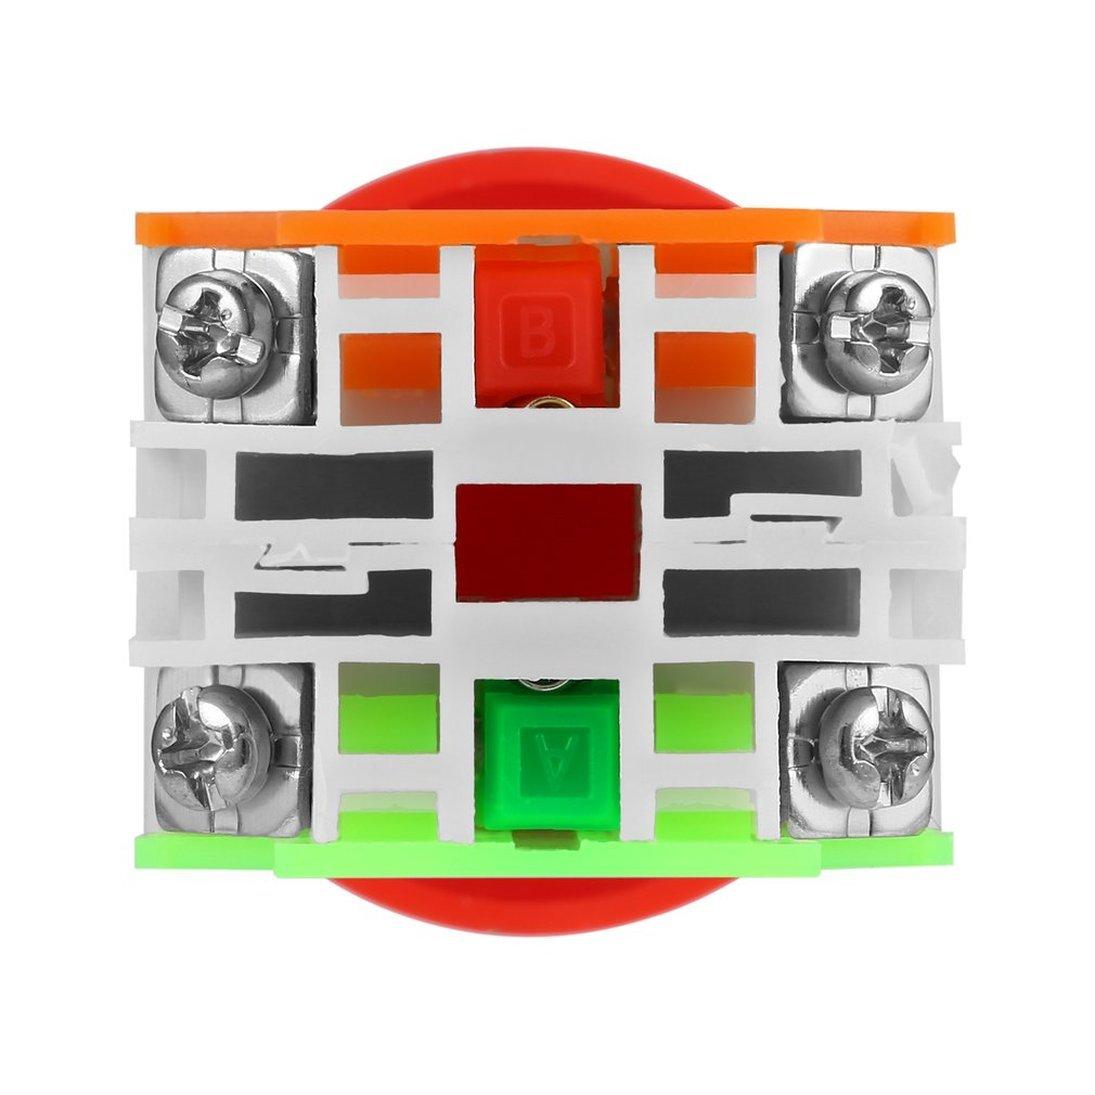 10A Bot/ón de superficie de pl/ástico de 40 mm ToGames-ES Bot/ón NC N//C Interruptor de parada de emergencia Bot/ón pulsador de seta 4 Terminal de tornillo 600 V